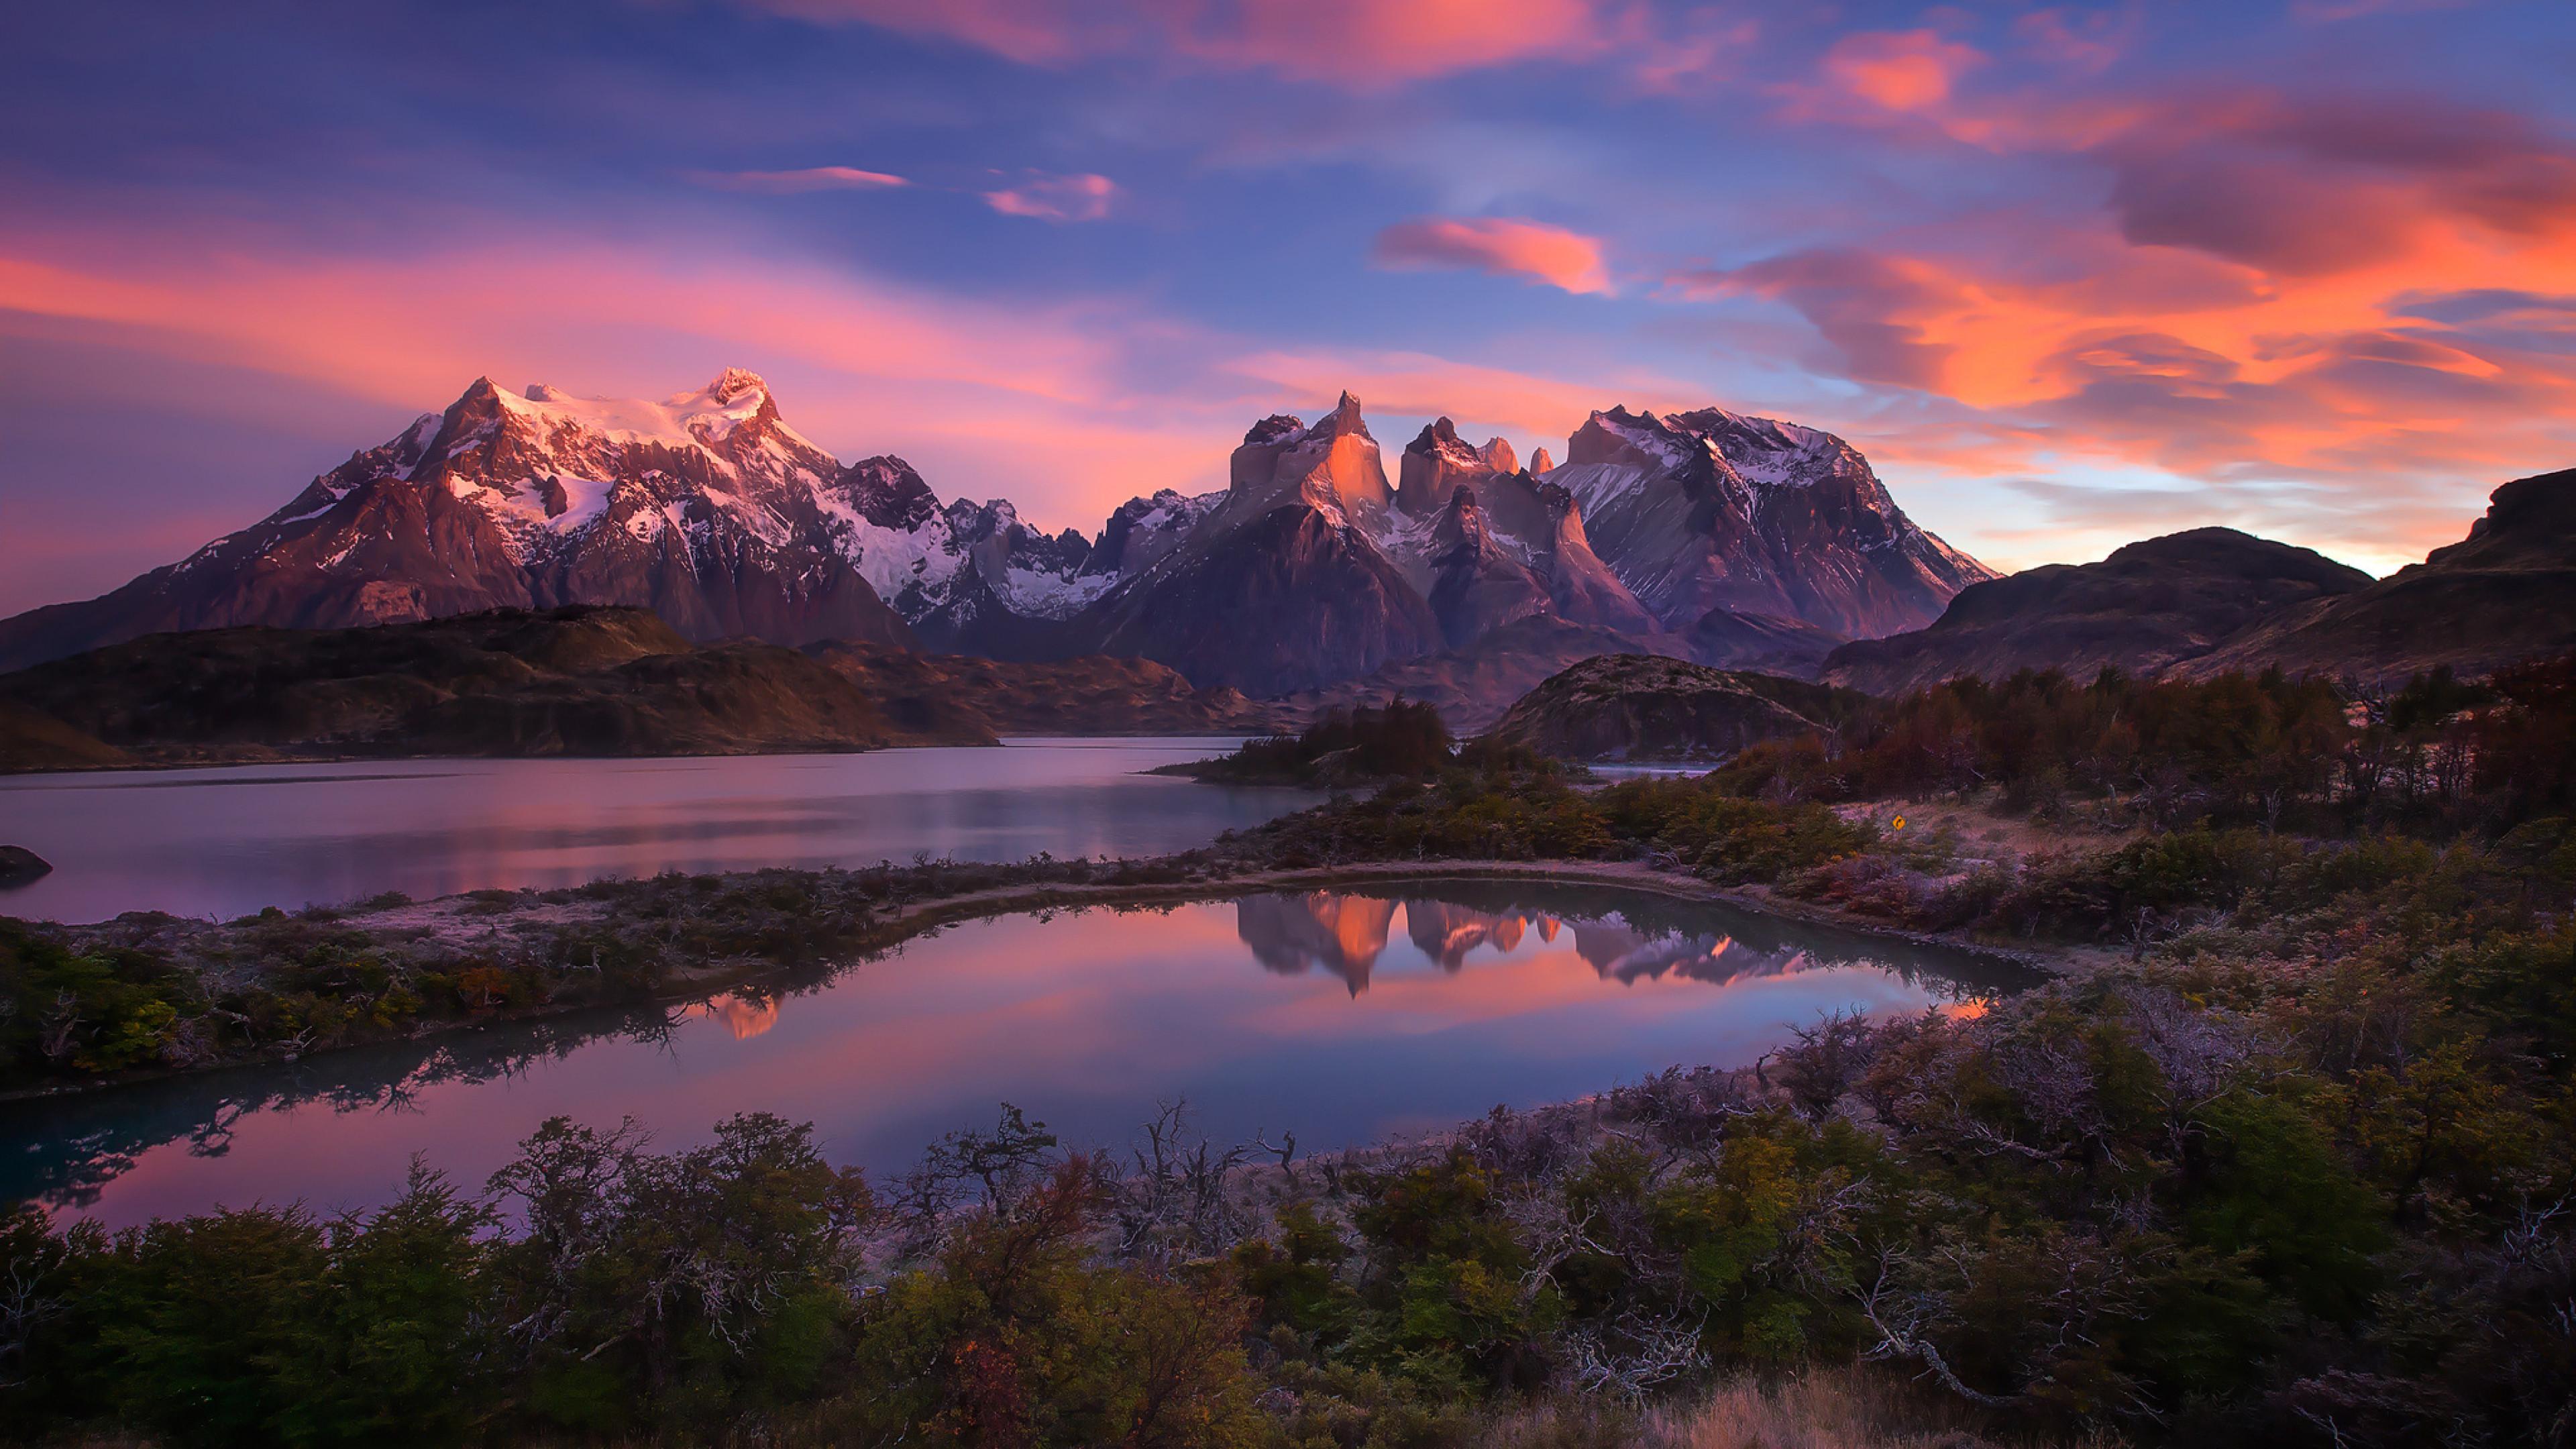 Patagonia Wallpapers 61 images